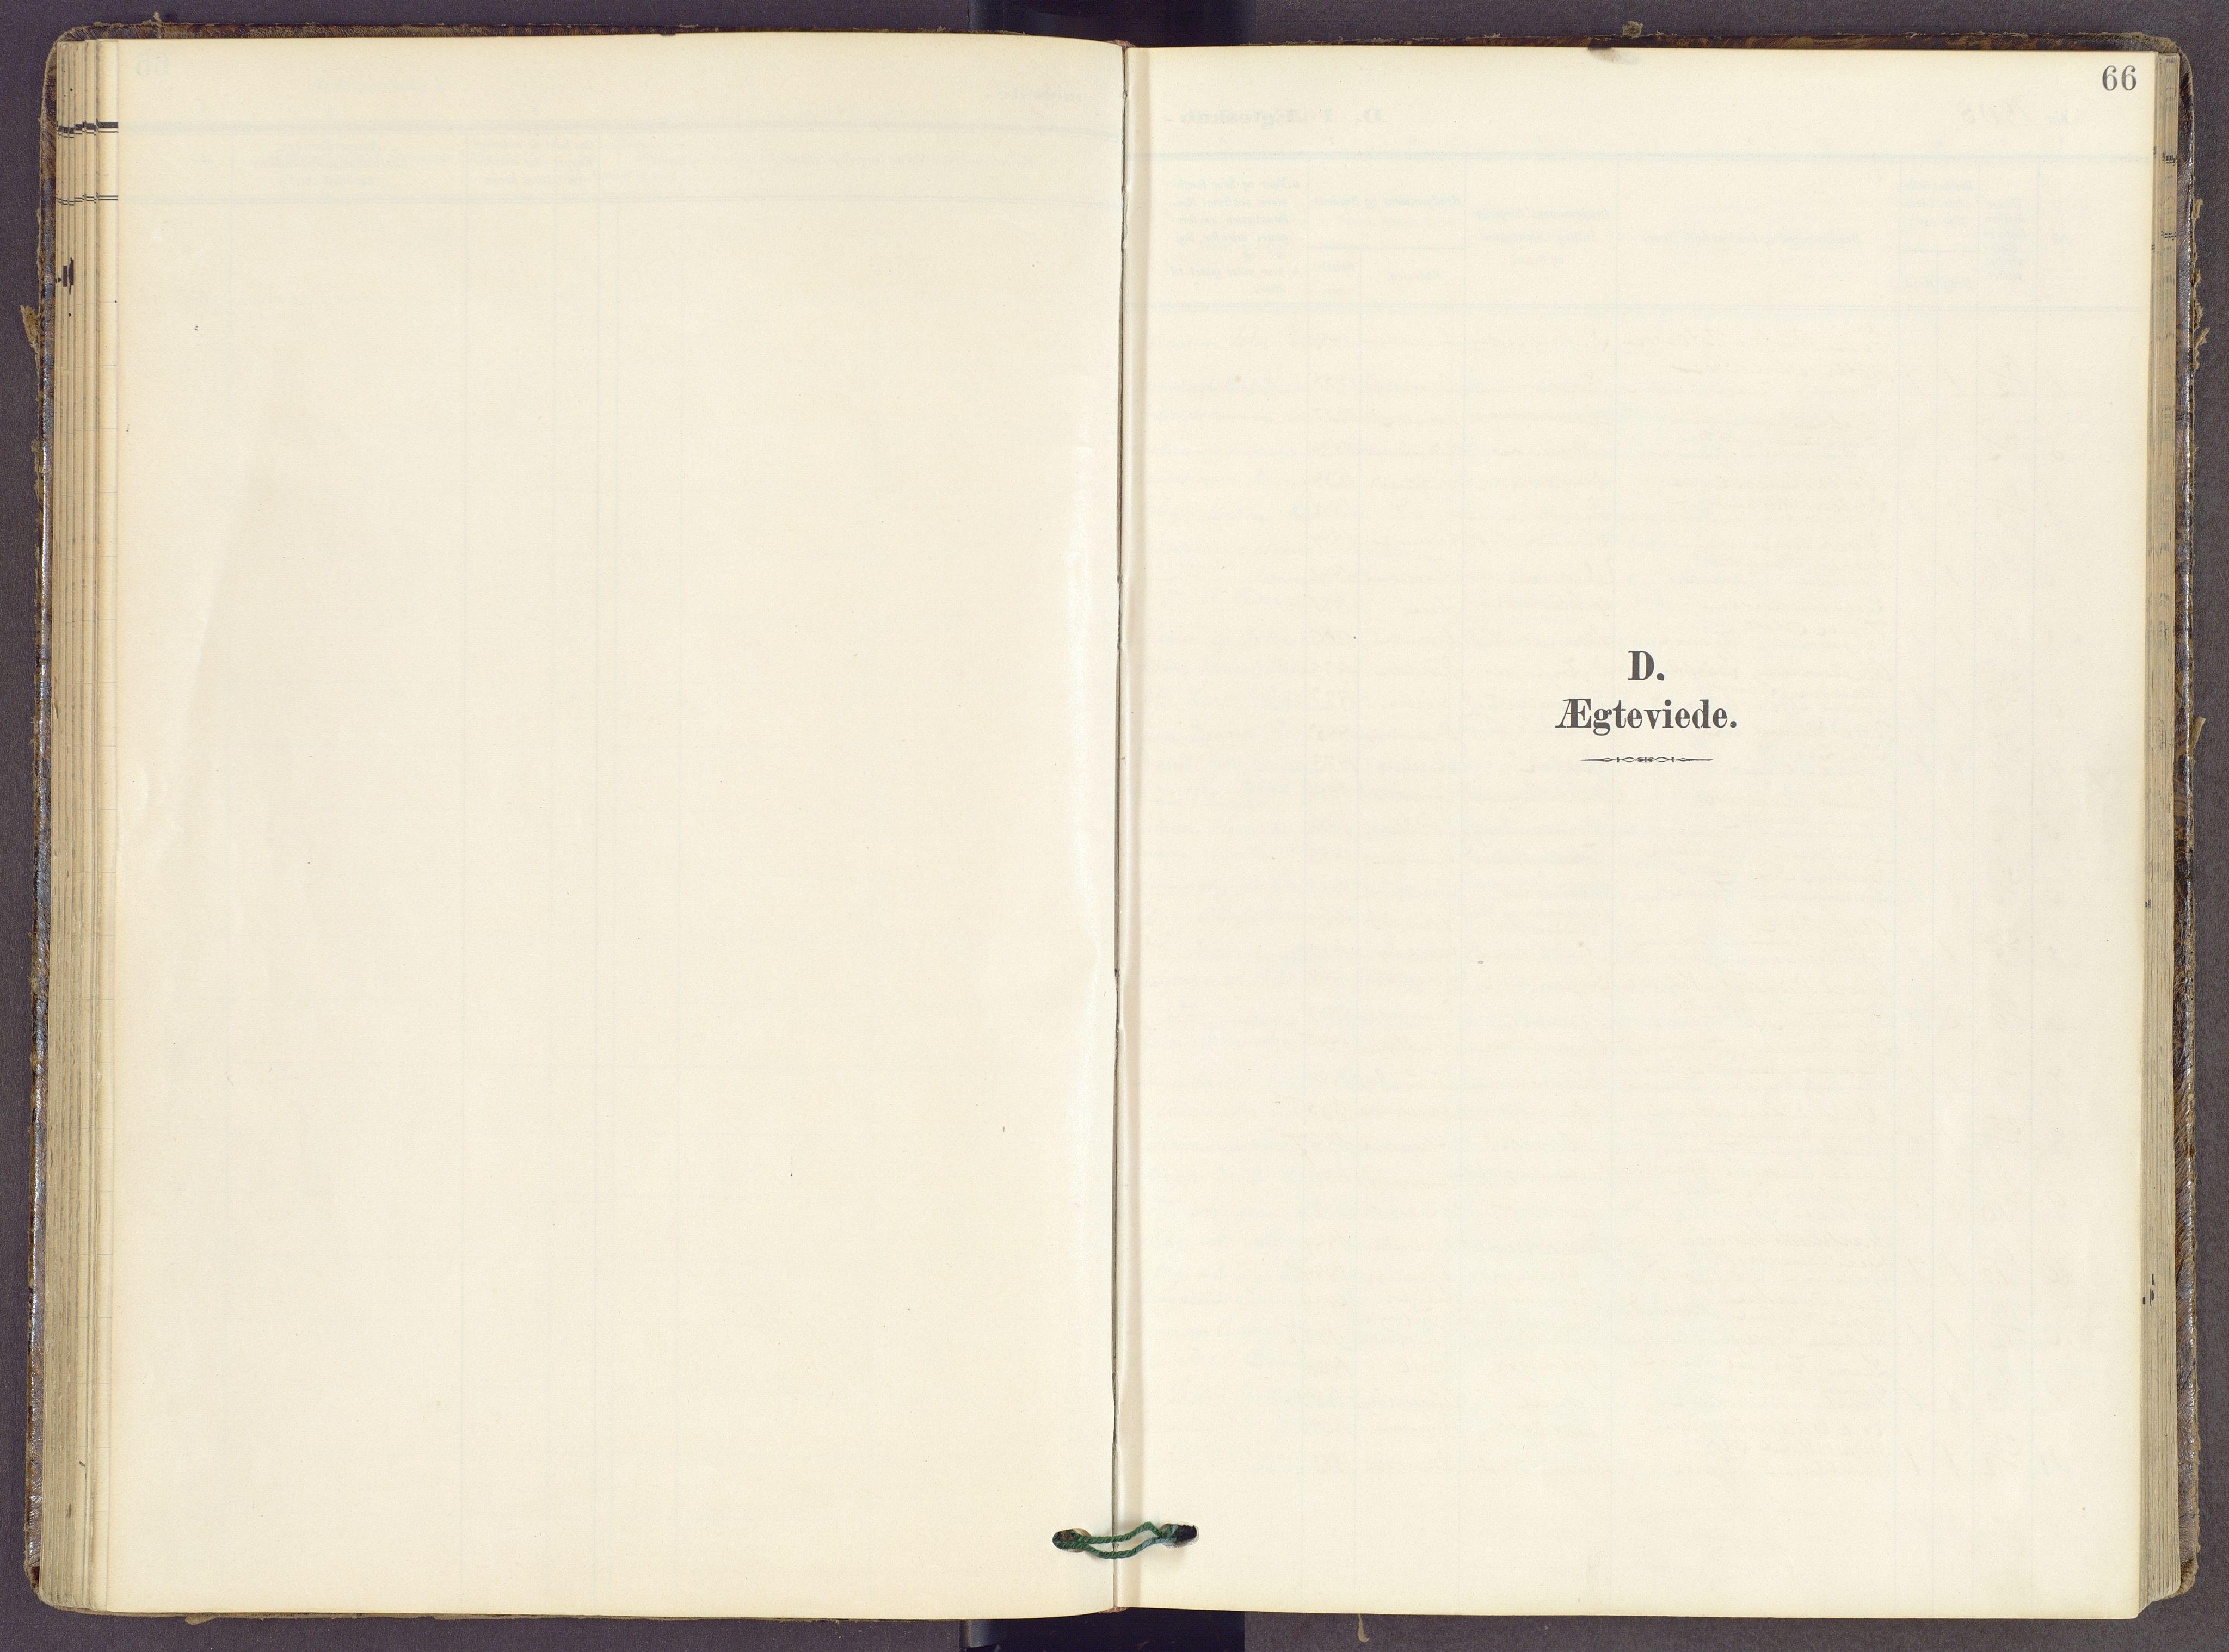 SAH, Gran prestekontor, Ministerialbok nr. 22, 1908-1918, s. 66